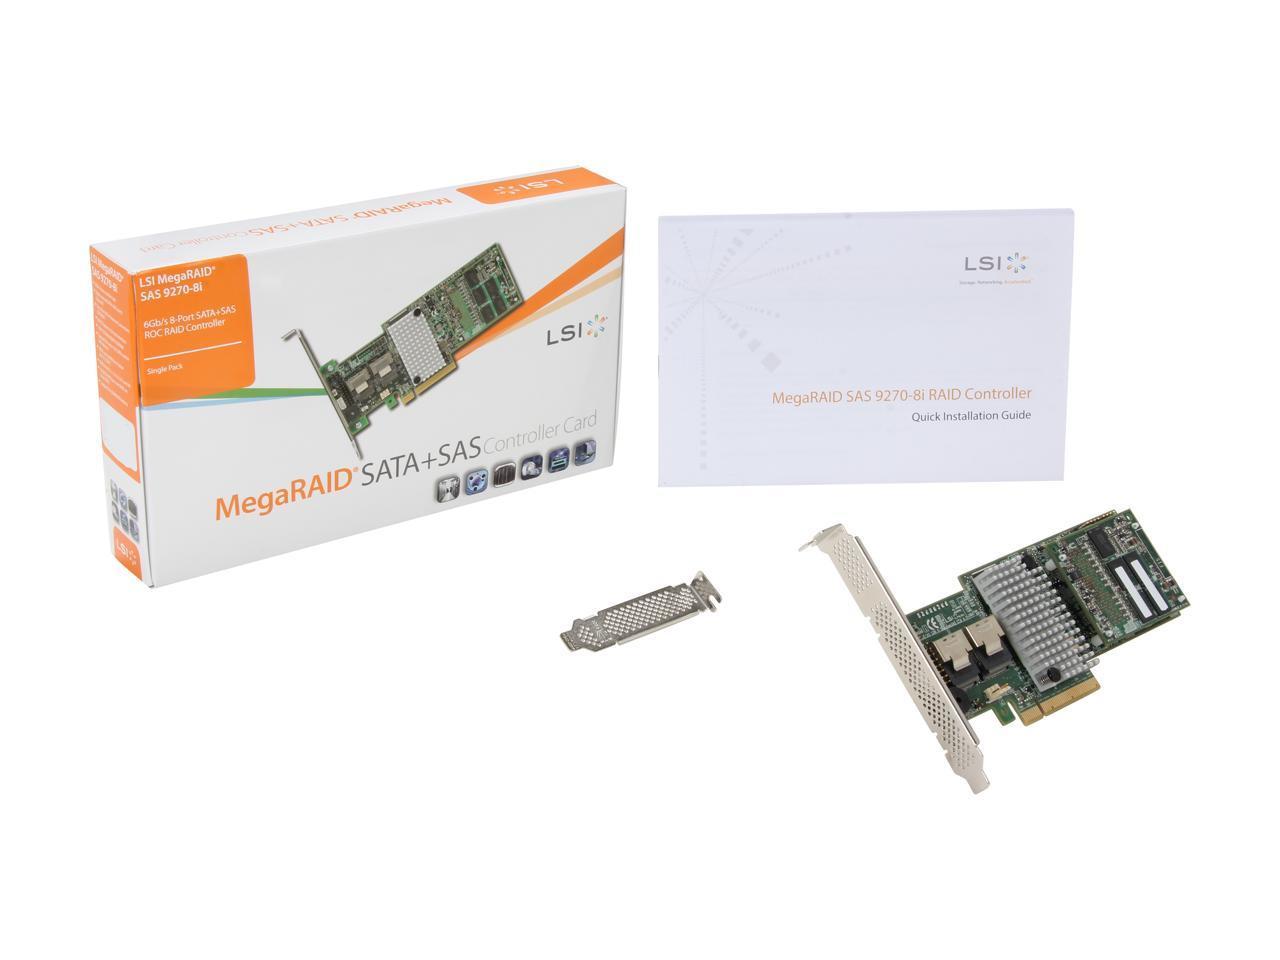 *NEW* Low Profile Bracket for LSI MegaRAID SAS 9270-8i